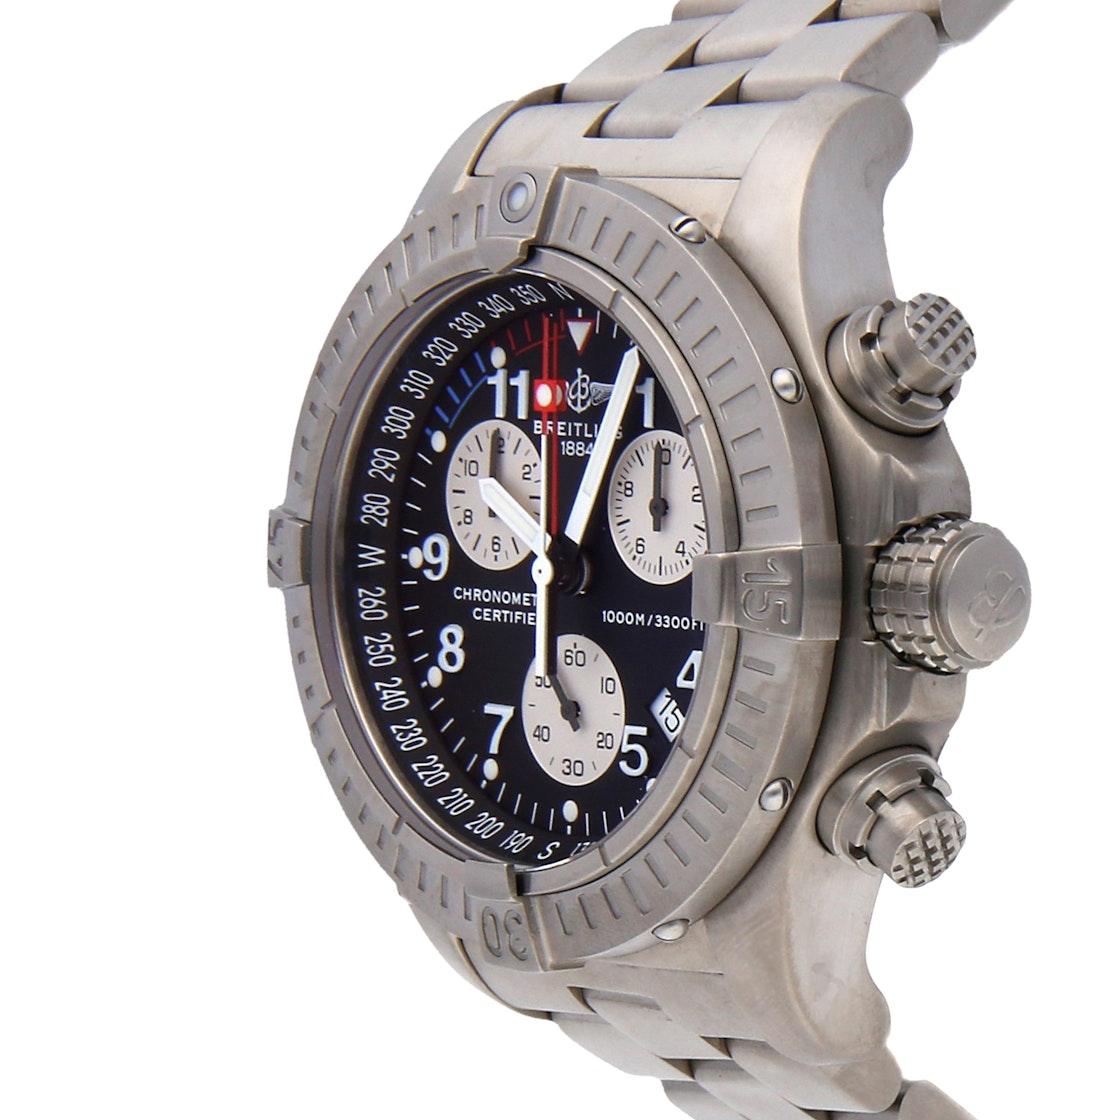 Breitling Avenger M1 Chronograph E73360